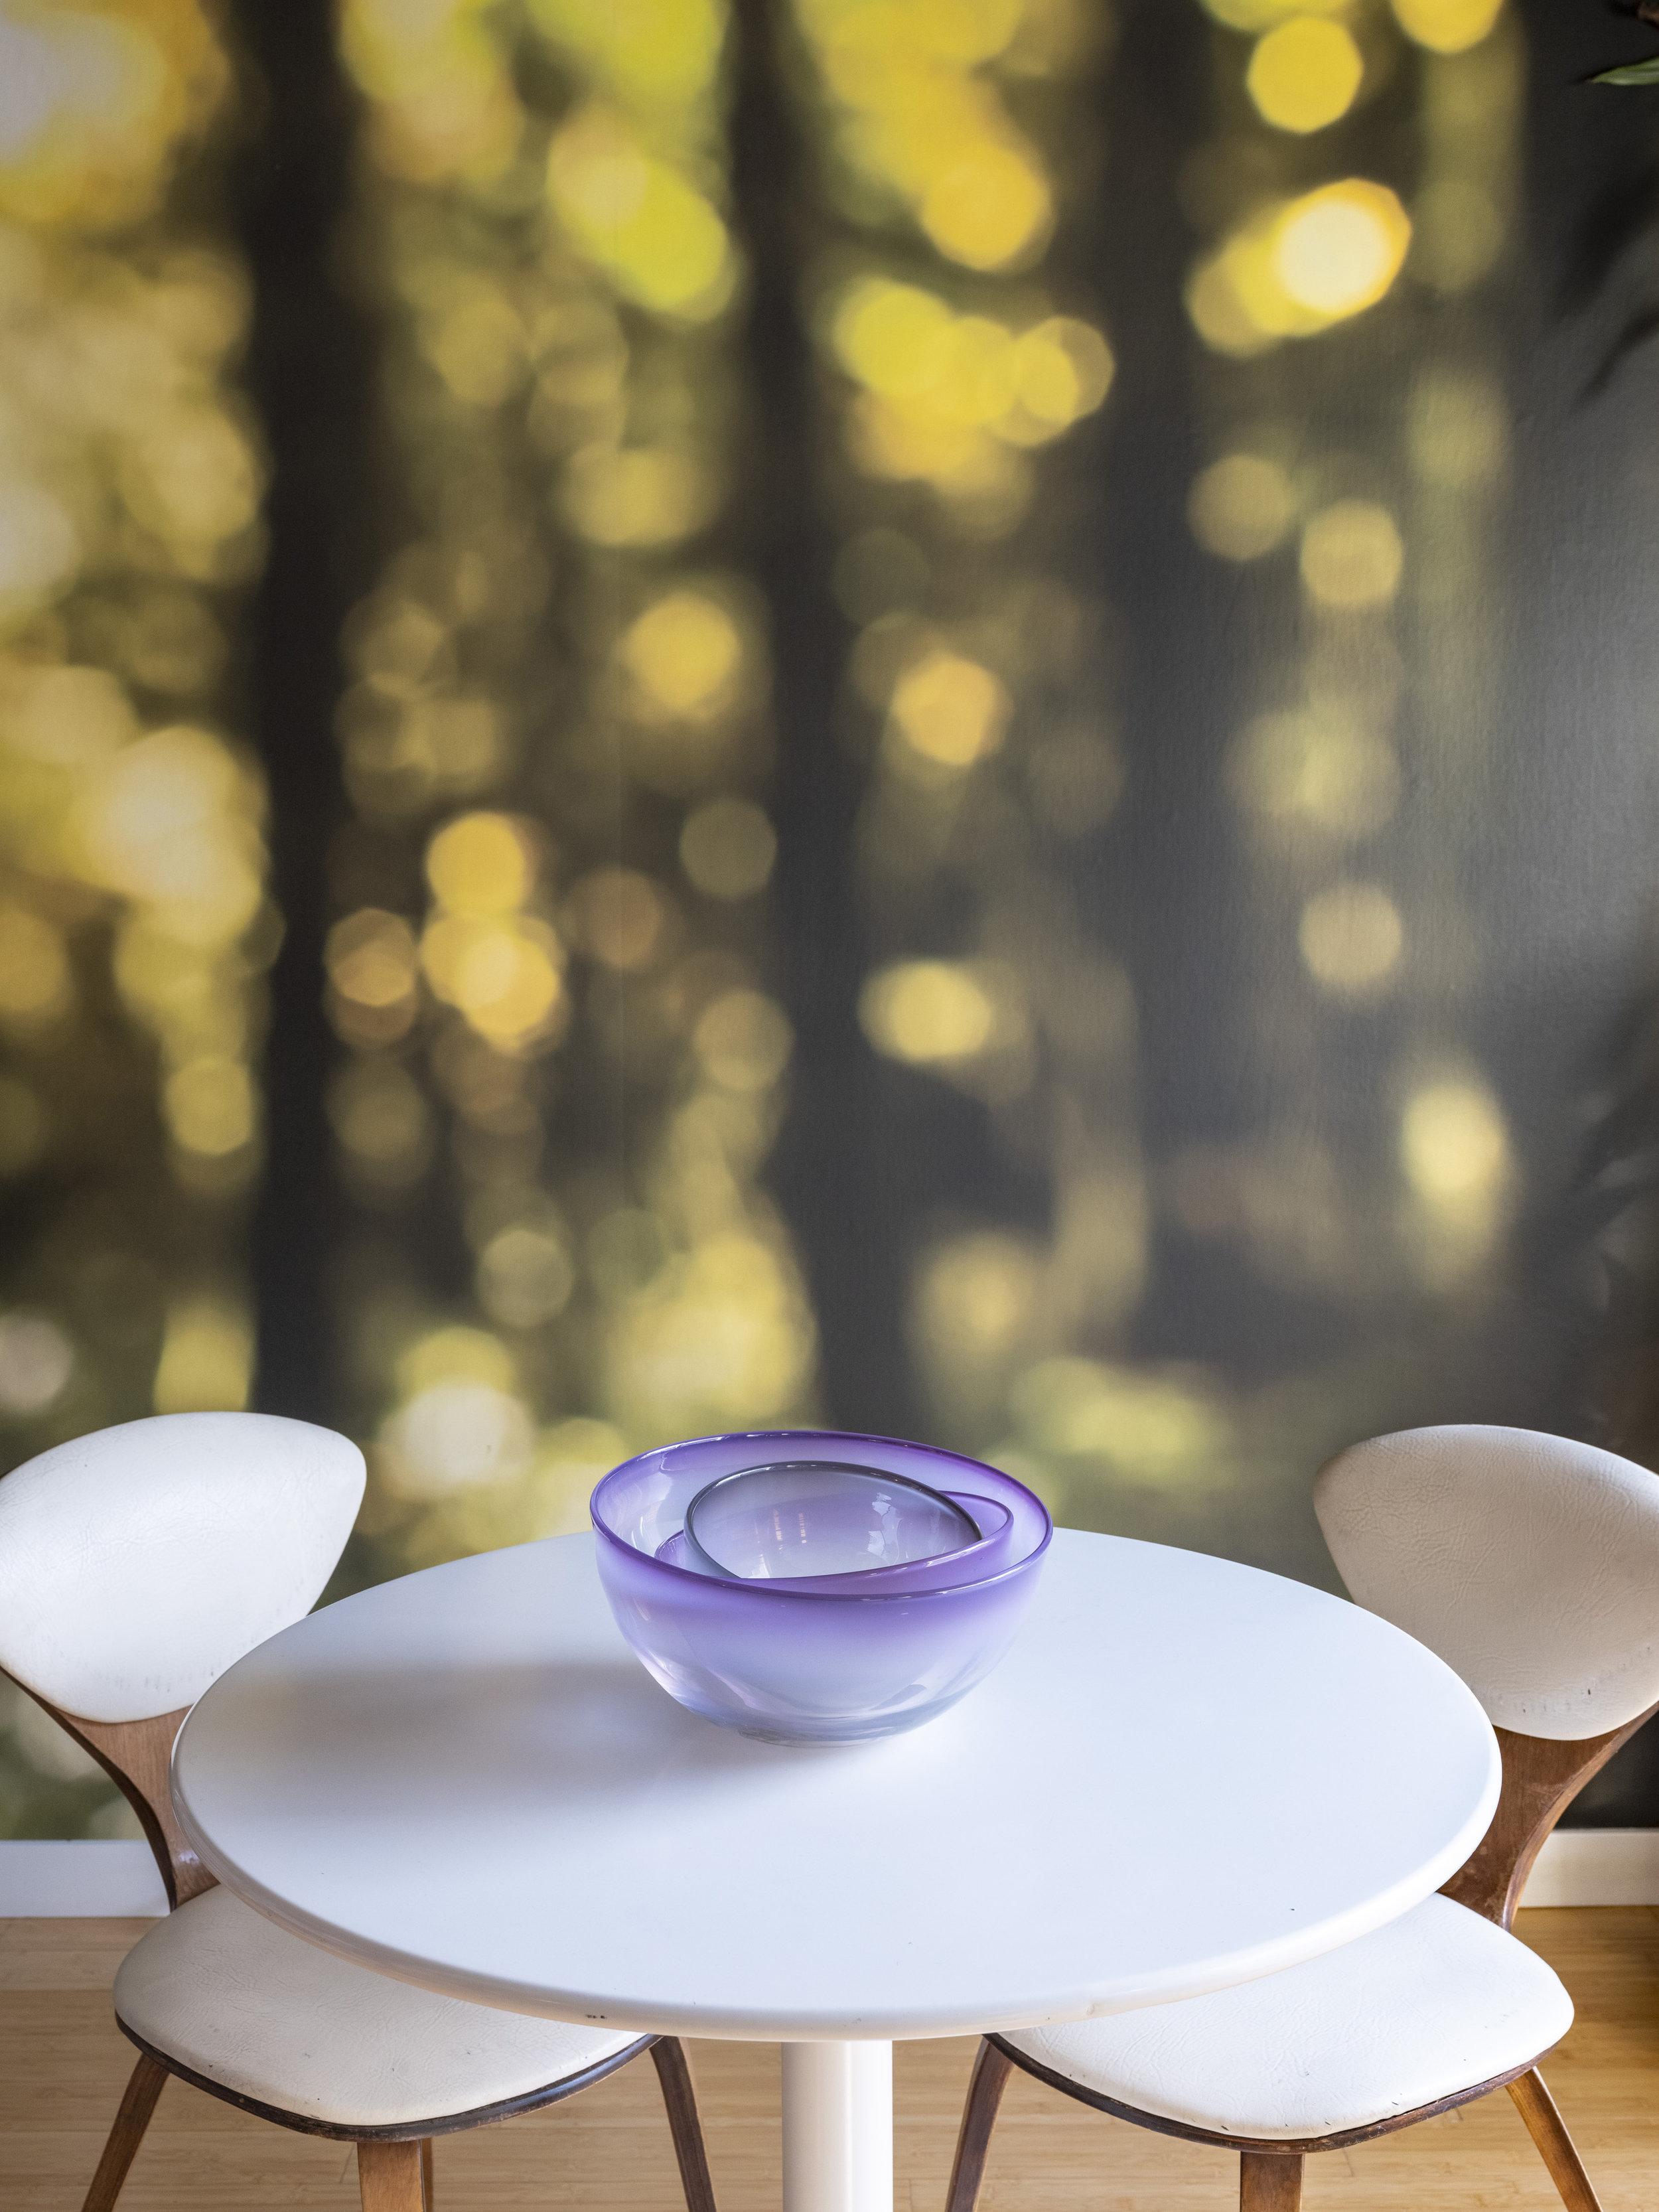 Aerie Bowl | Small, Medium, Large | Color Shown: Lavender